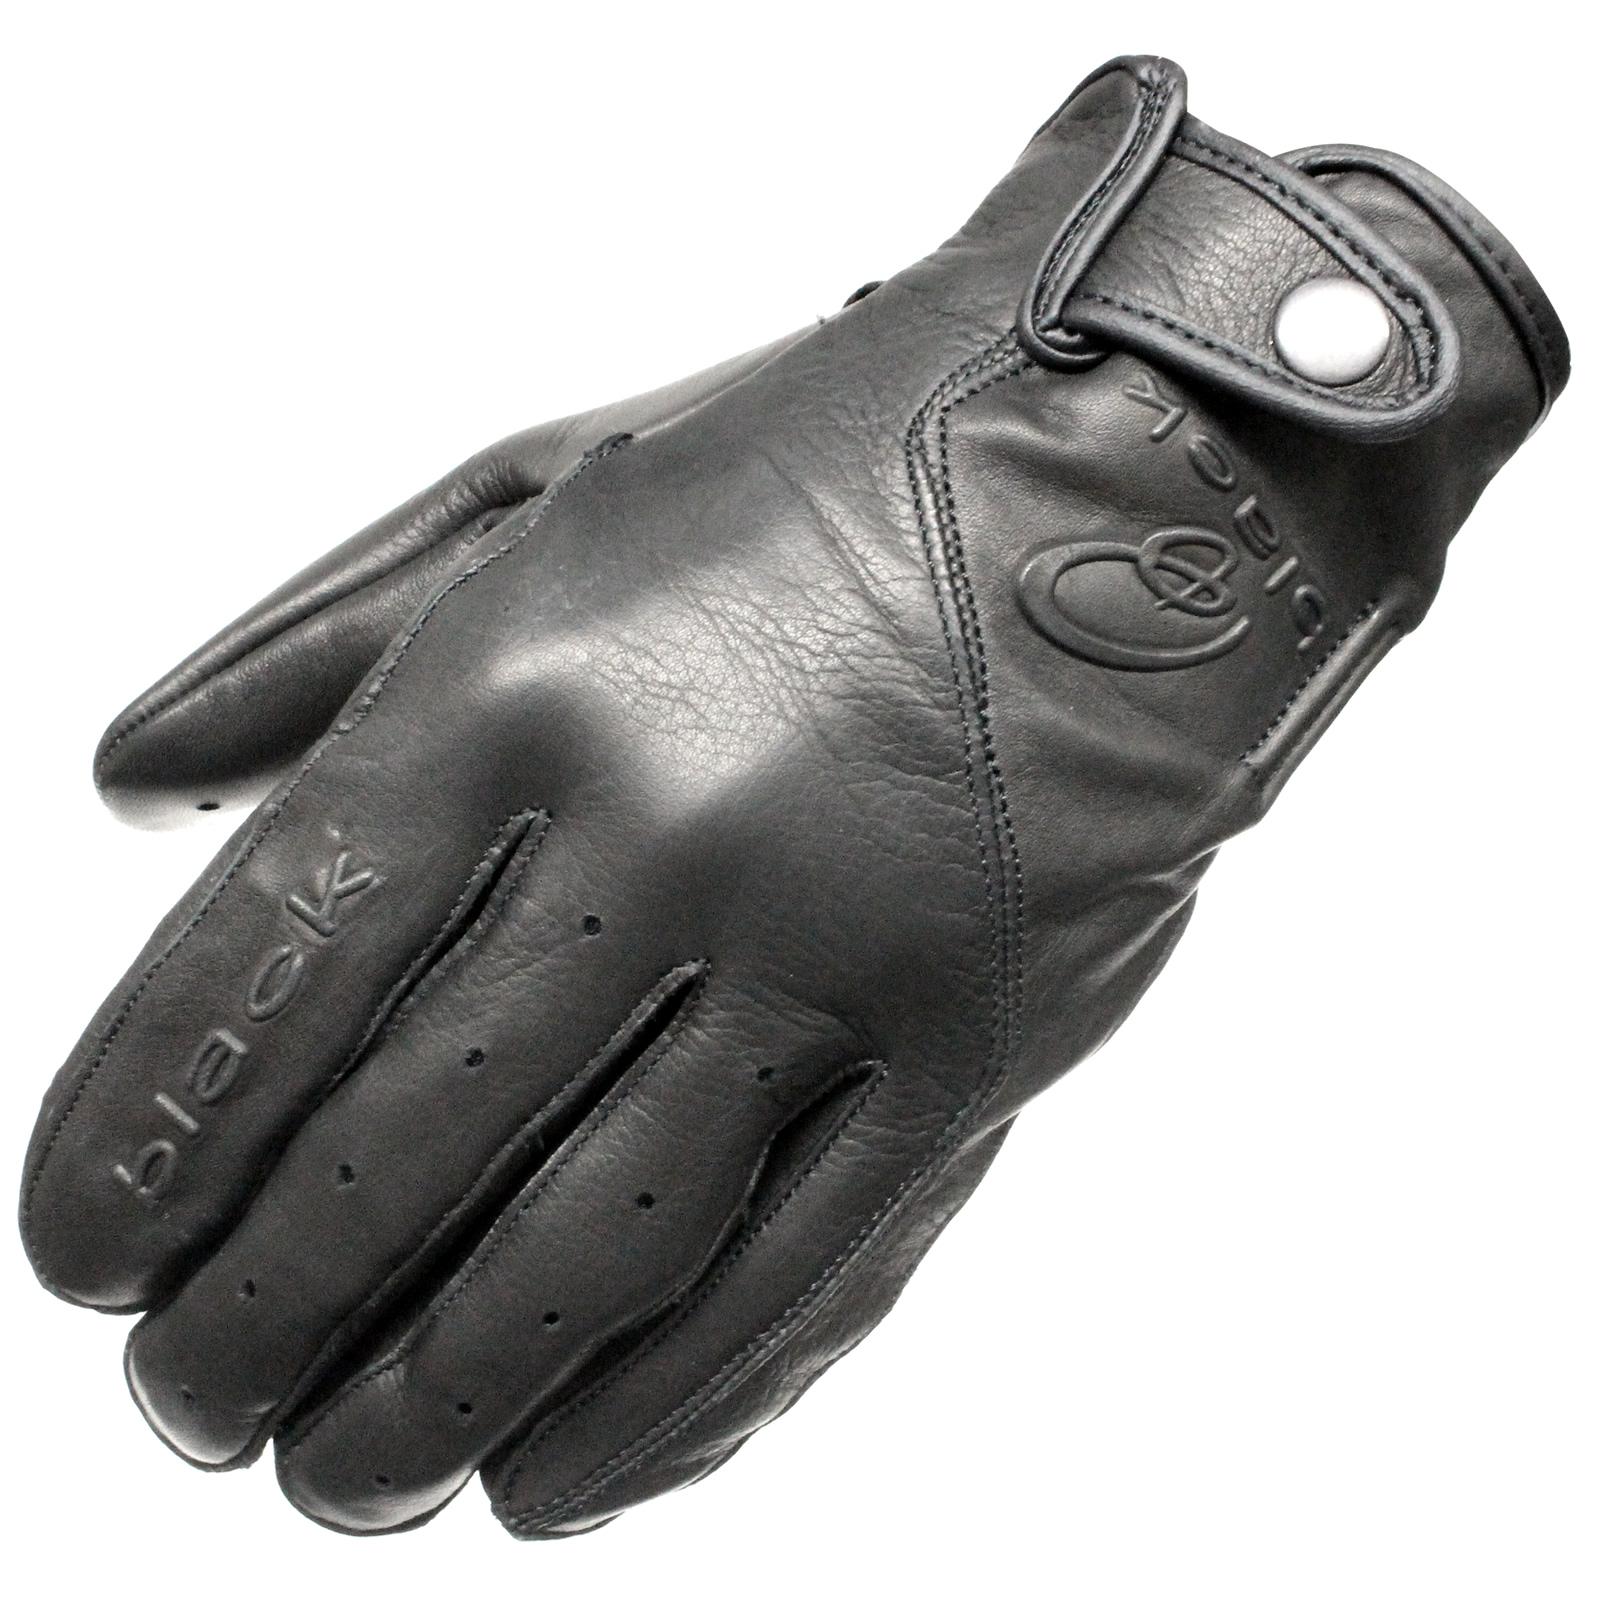 Buy leather bike gloves - Black Static Leather Classic Vintage Fashion Motorcycle Bike